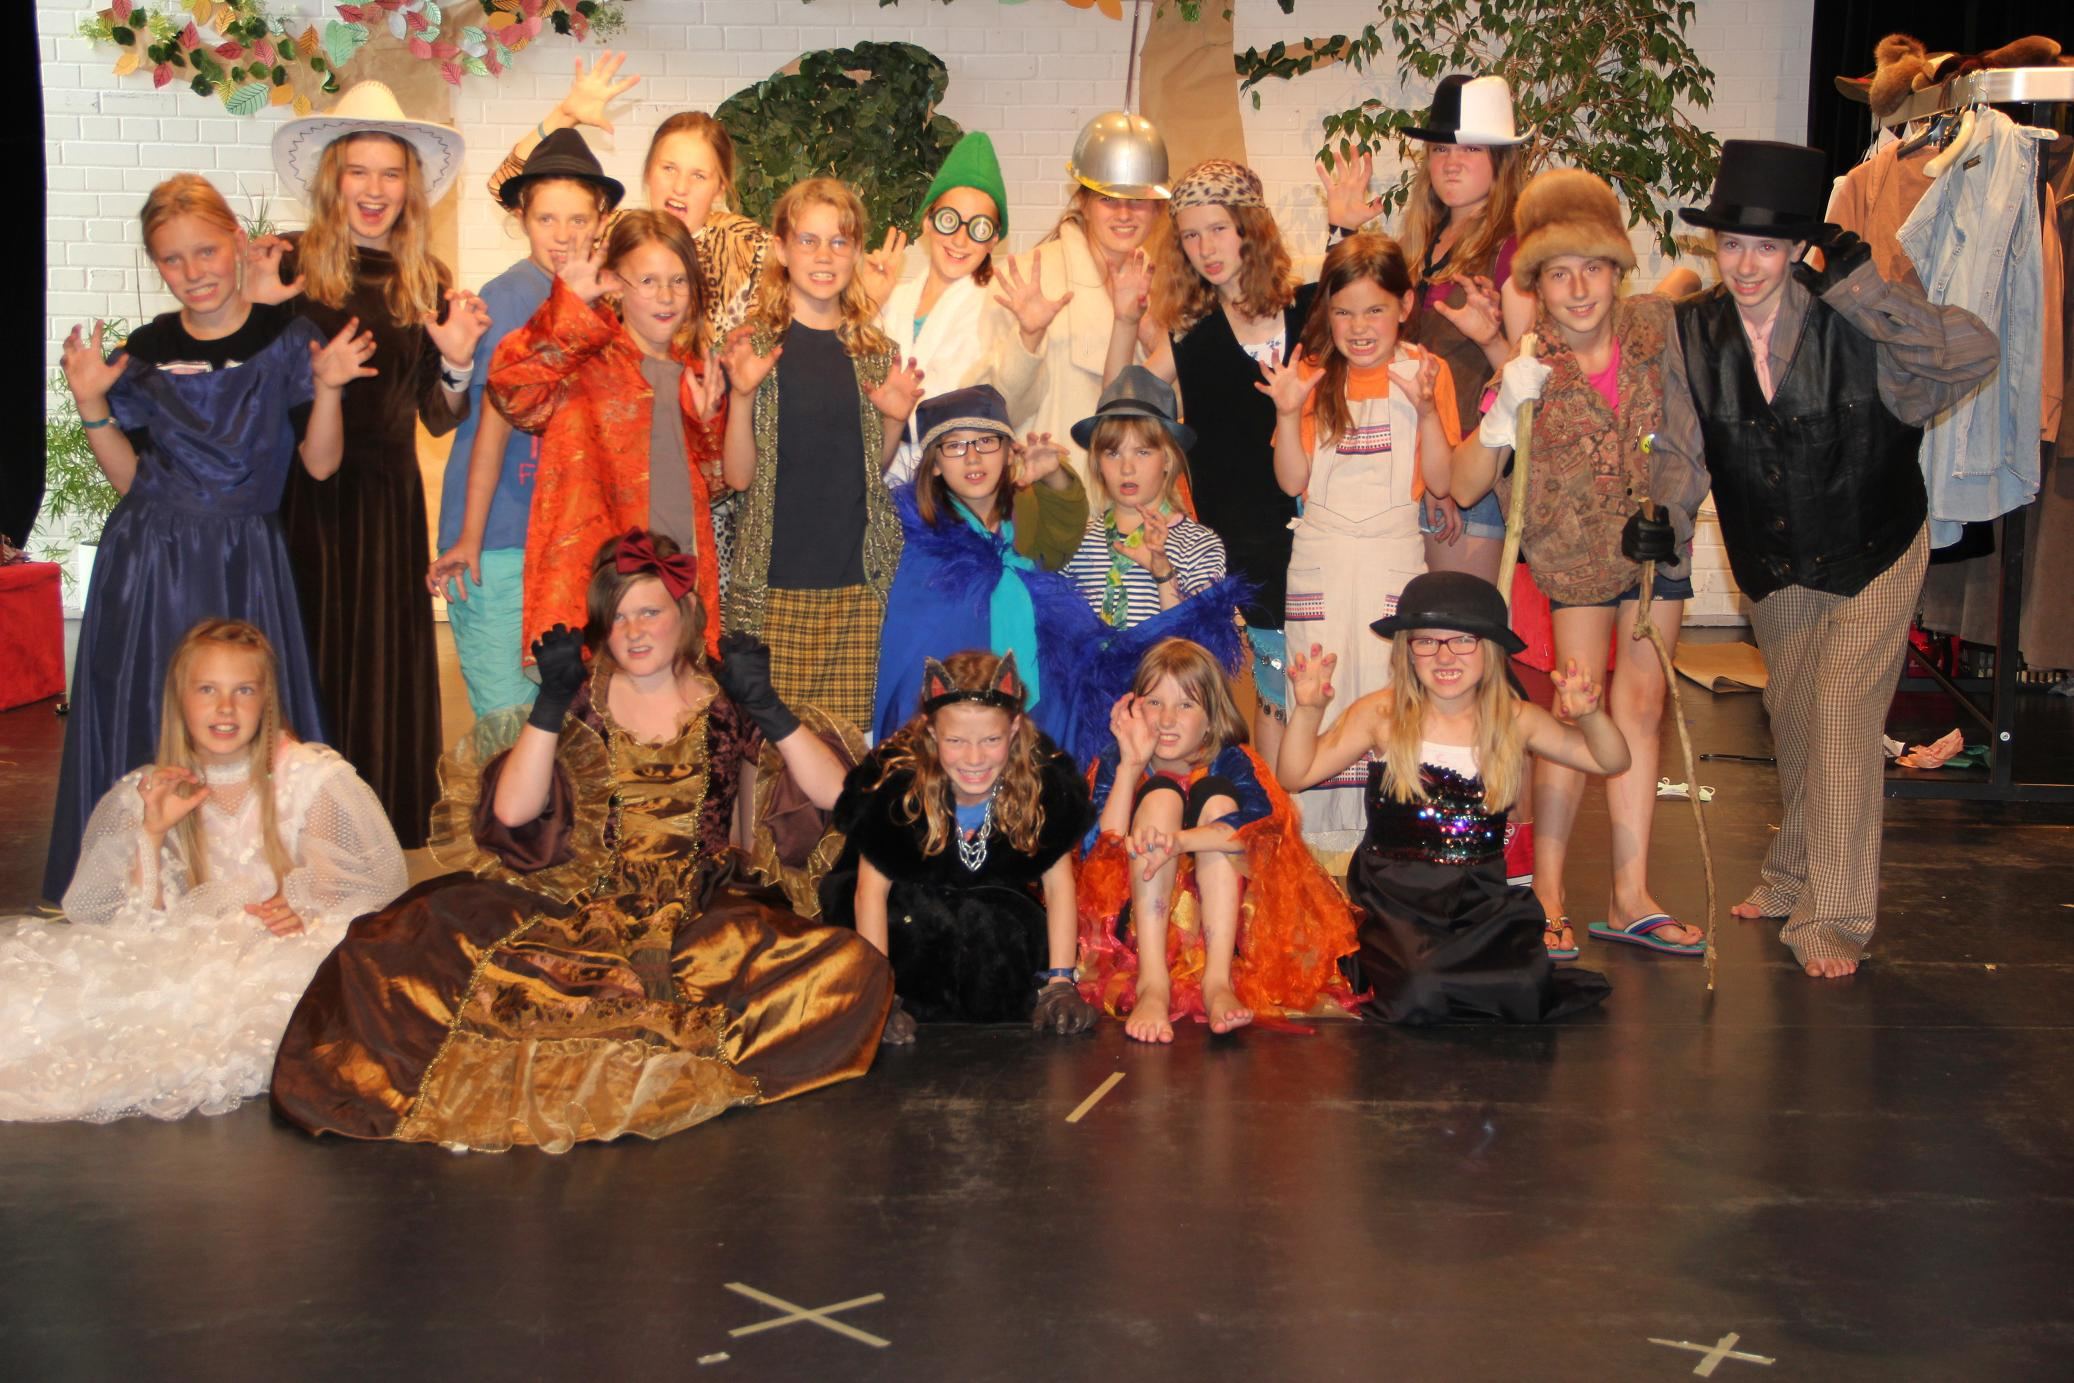 Vjka, Kindertheaterwoche 2014, klein.jpg